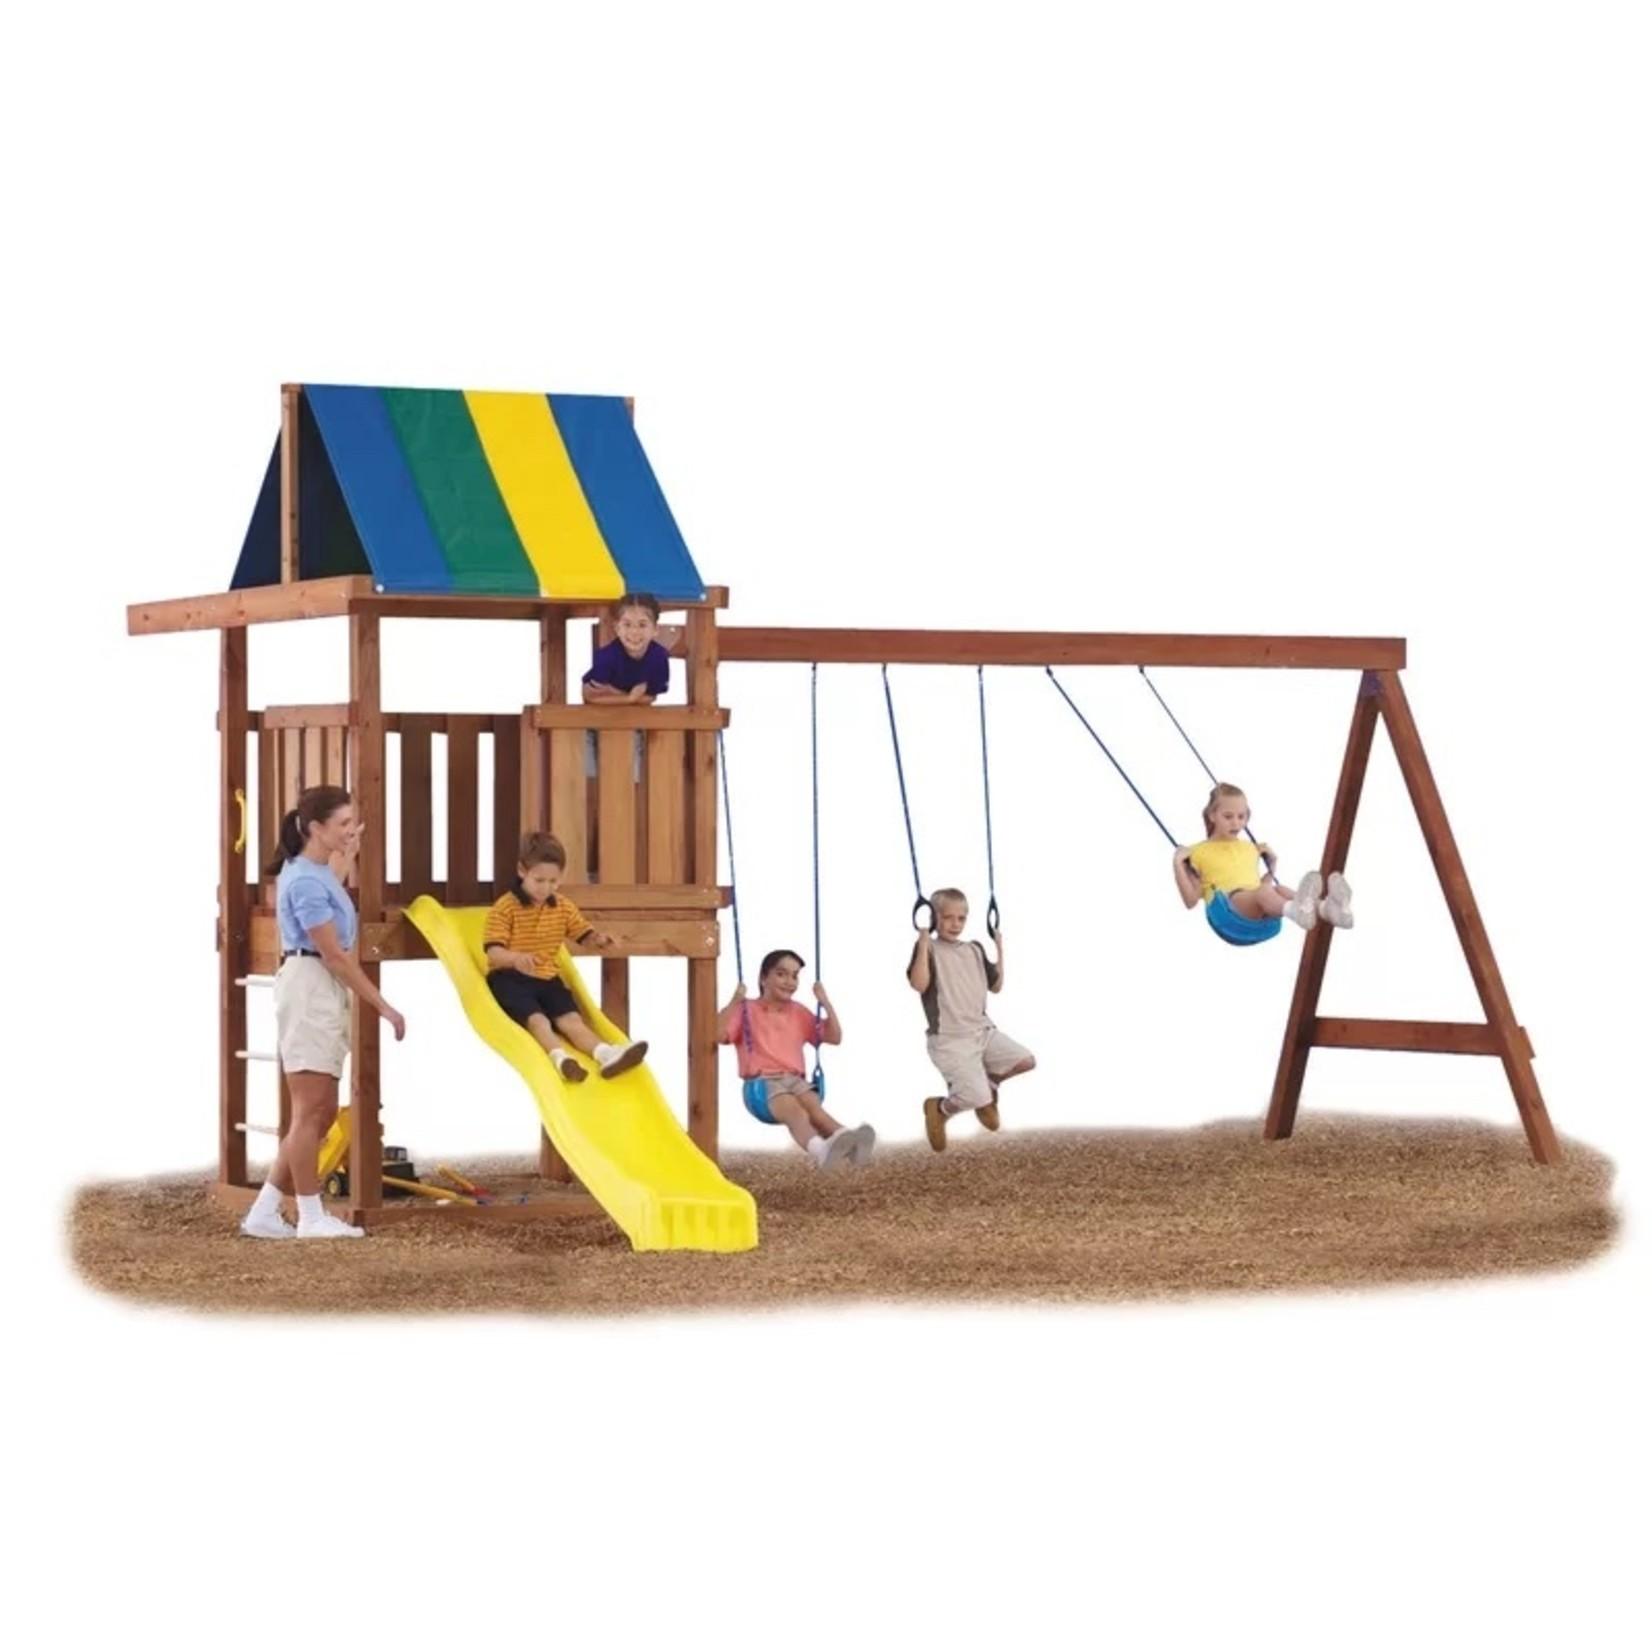 *Wrangler Custom DIY 12 Piece Swing Set Hardware Kit (Wood, Slide and Wood Screws Not Included)